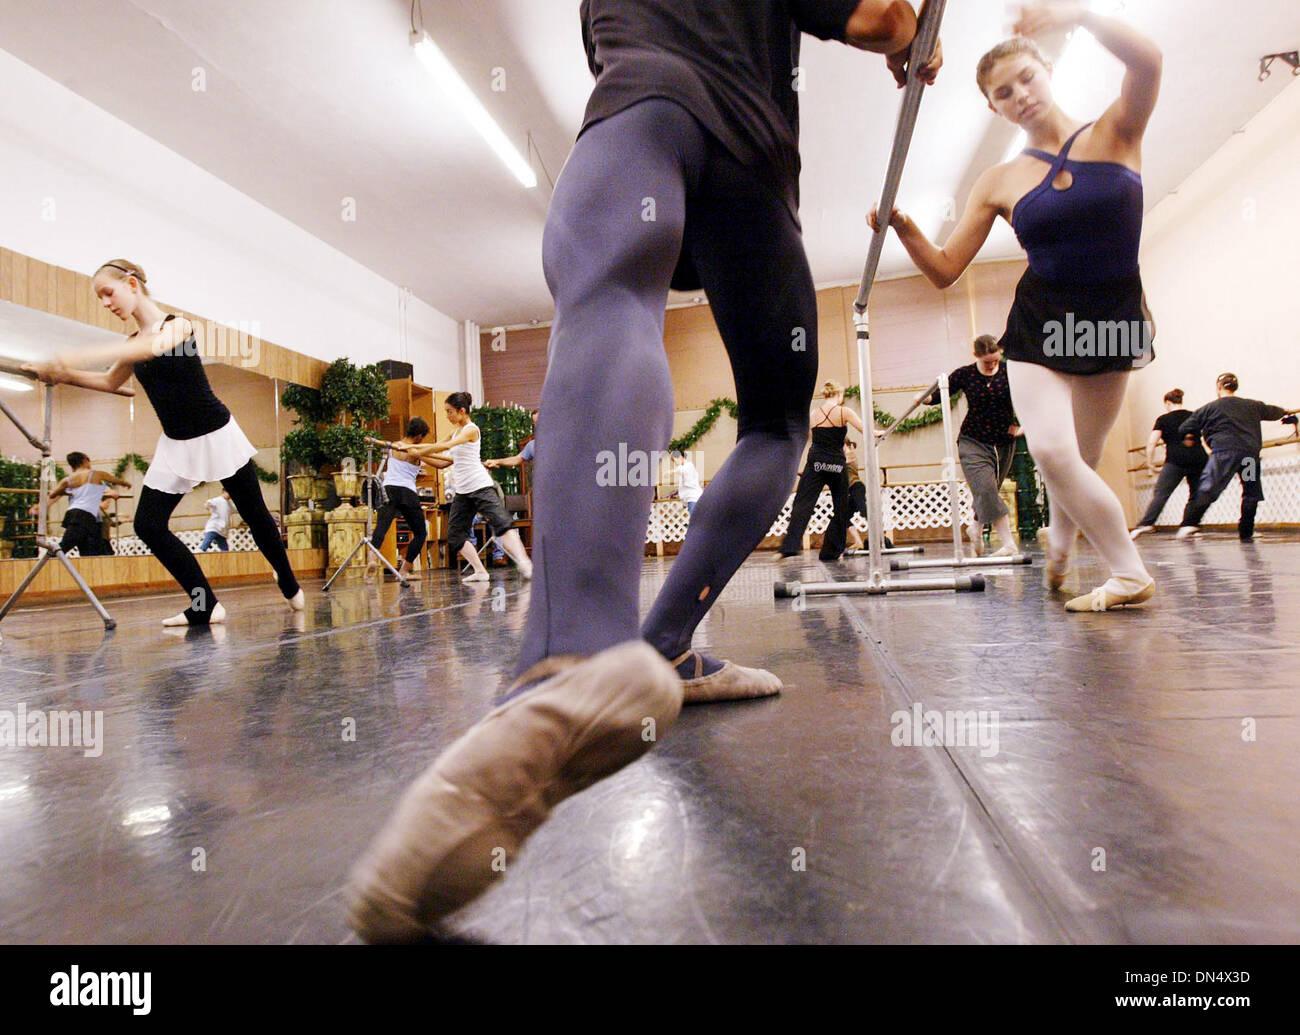 Nov 08, 2006; Hayward, CA, USA; Members of the Nutcracker Ballet rehearse at the Guidi's Ballet Studio in Oakland, Stock Photo